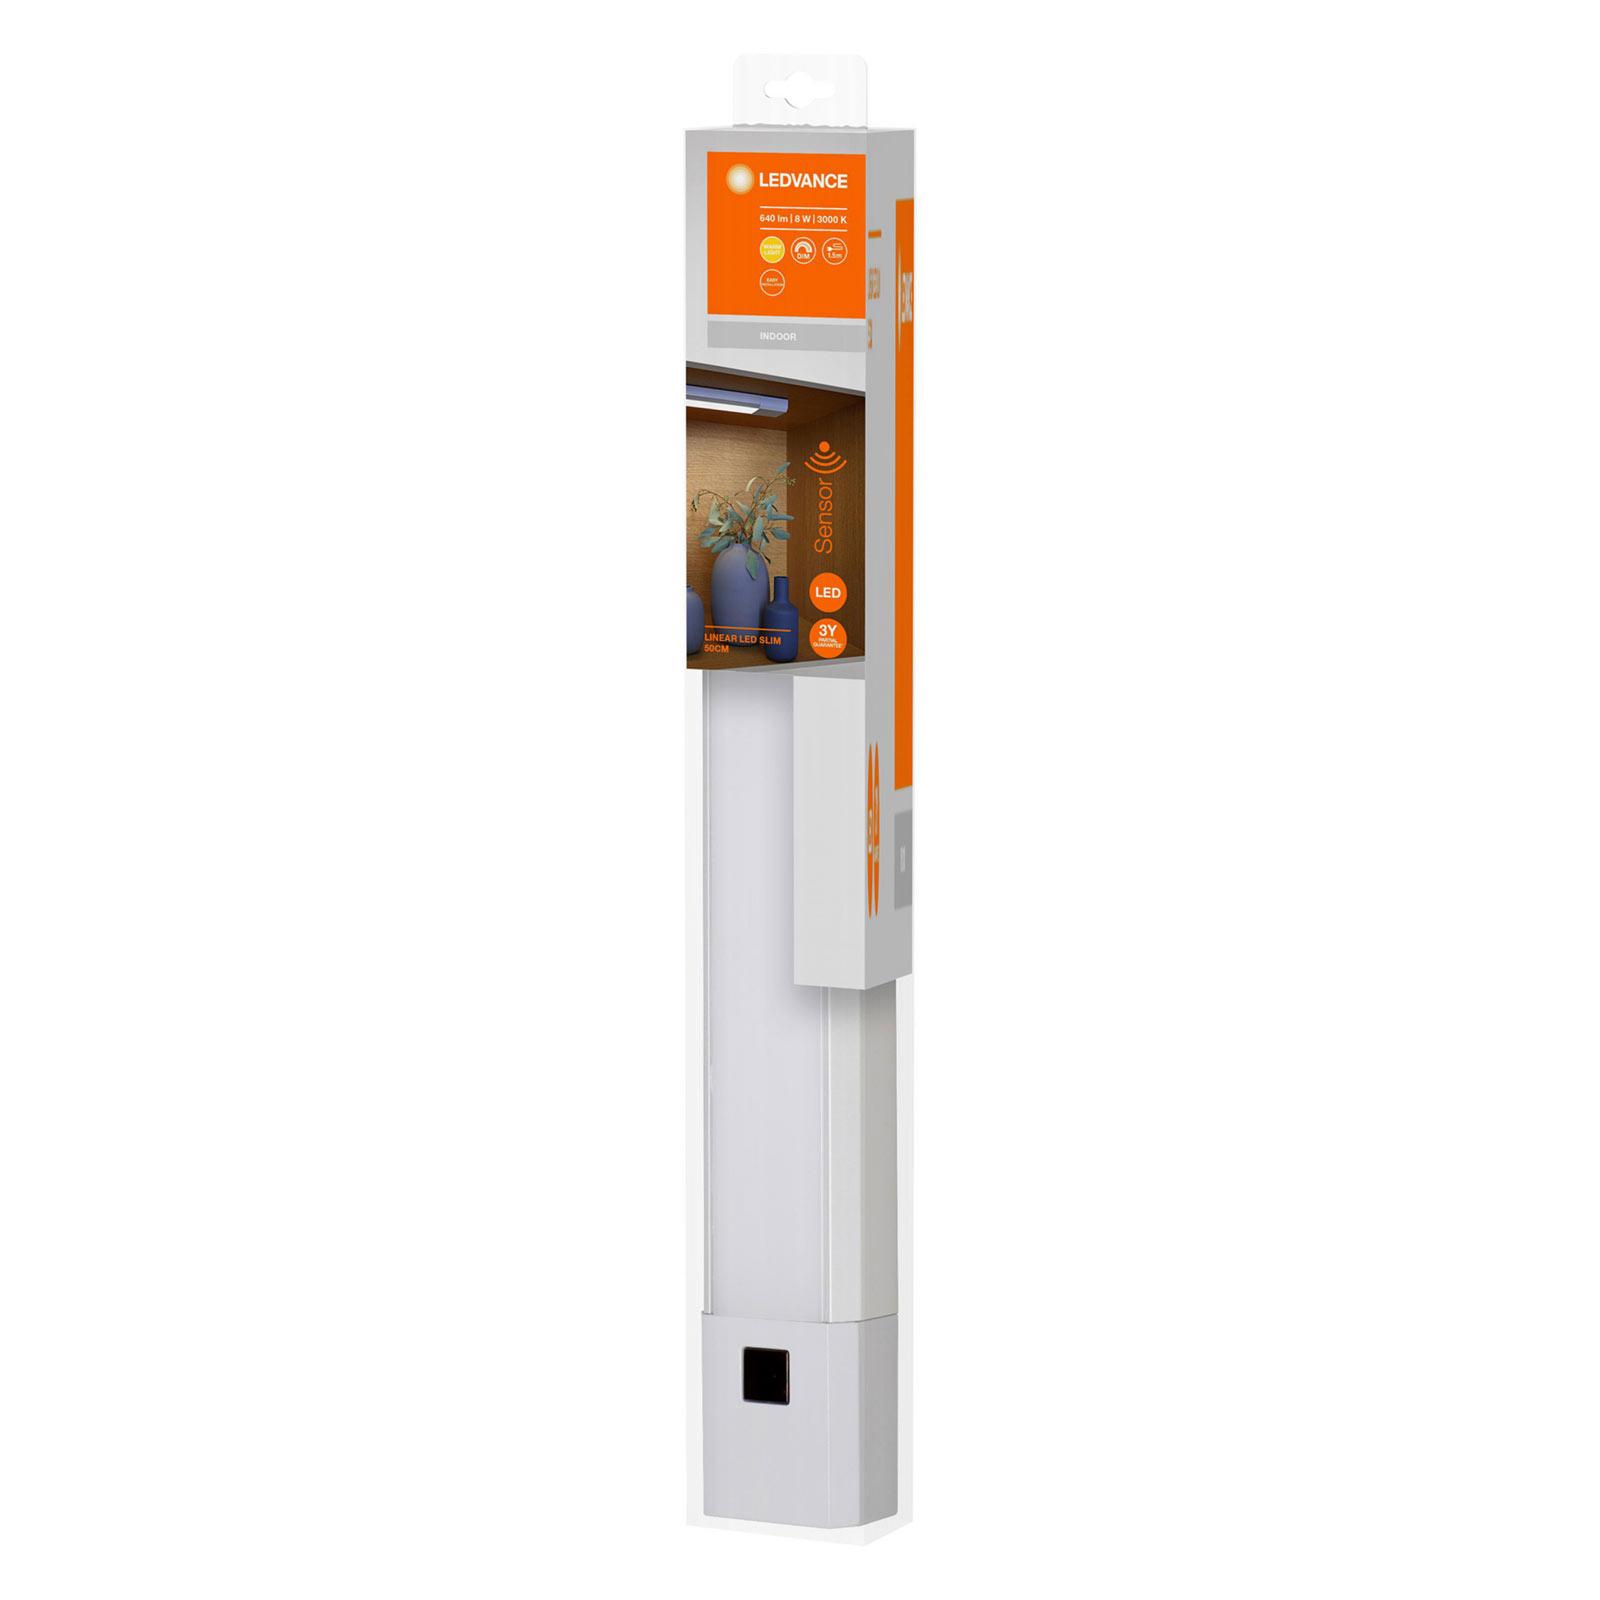 LEDVANCE Linear Slim -LED-kaapinalusvalaisin 50 cm